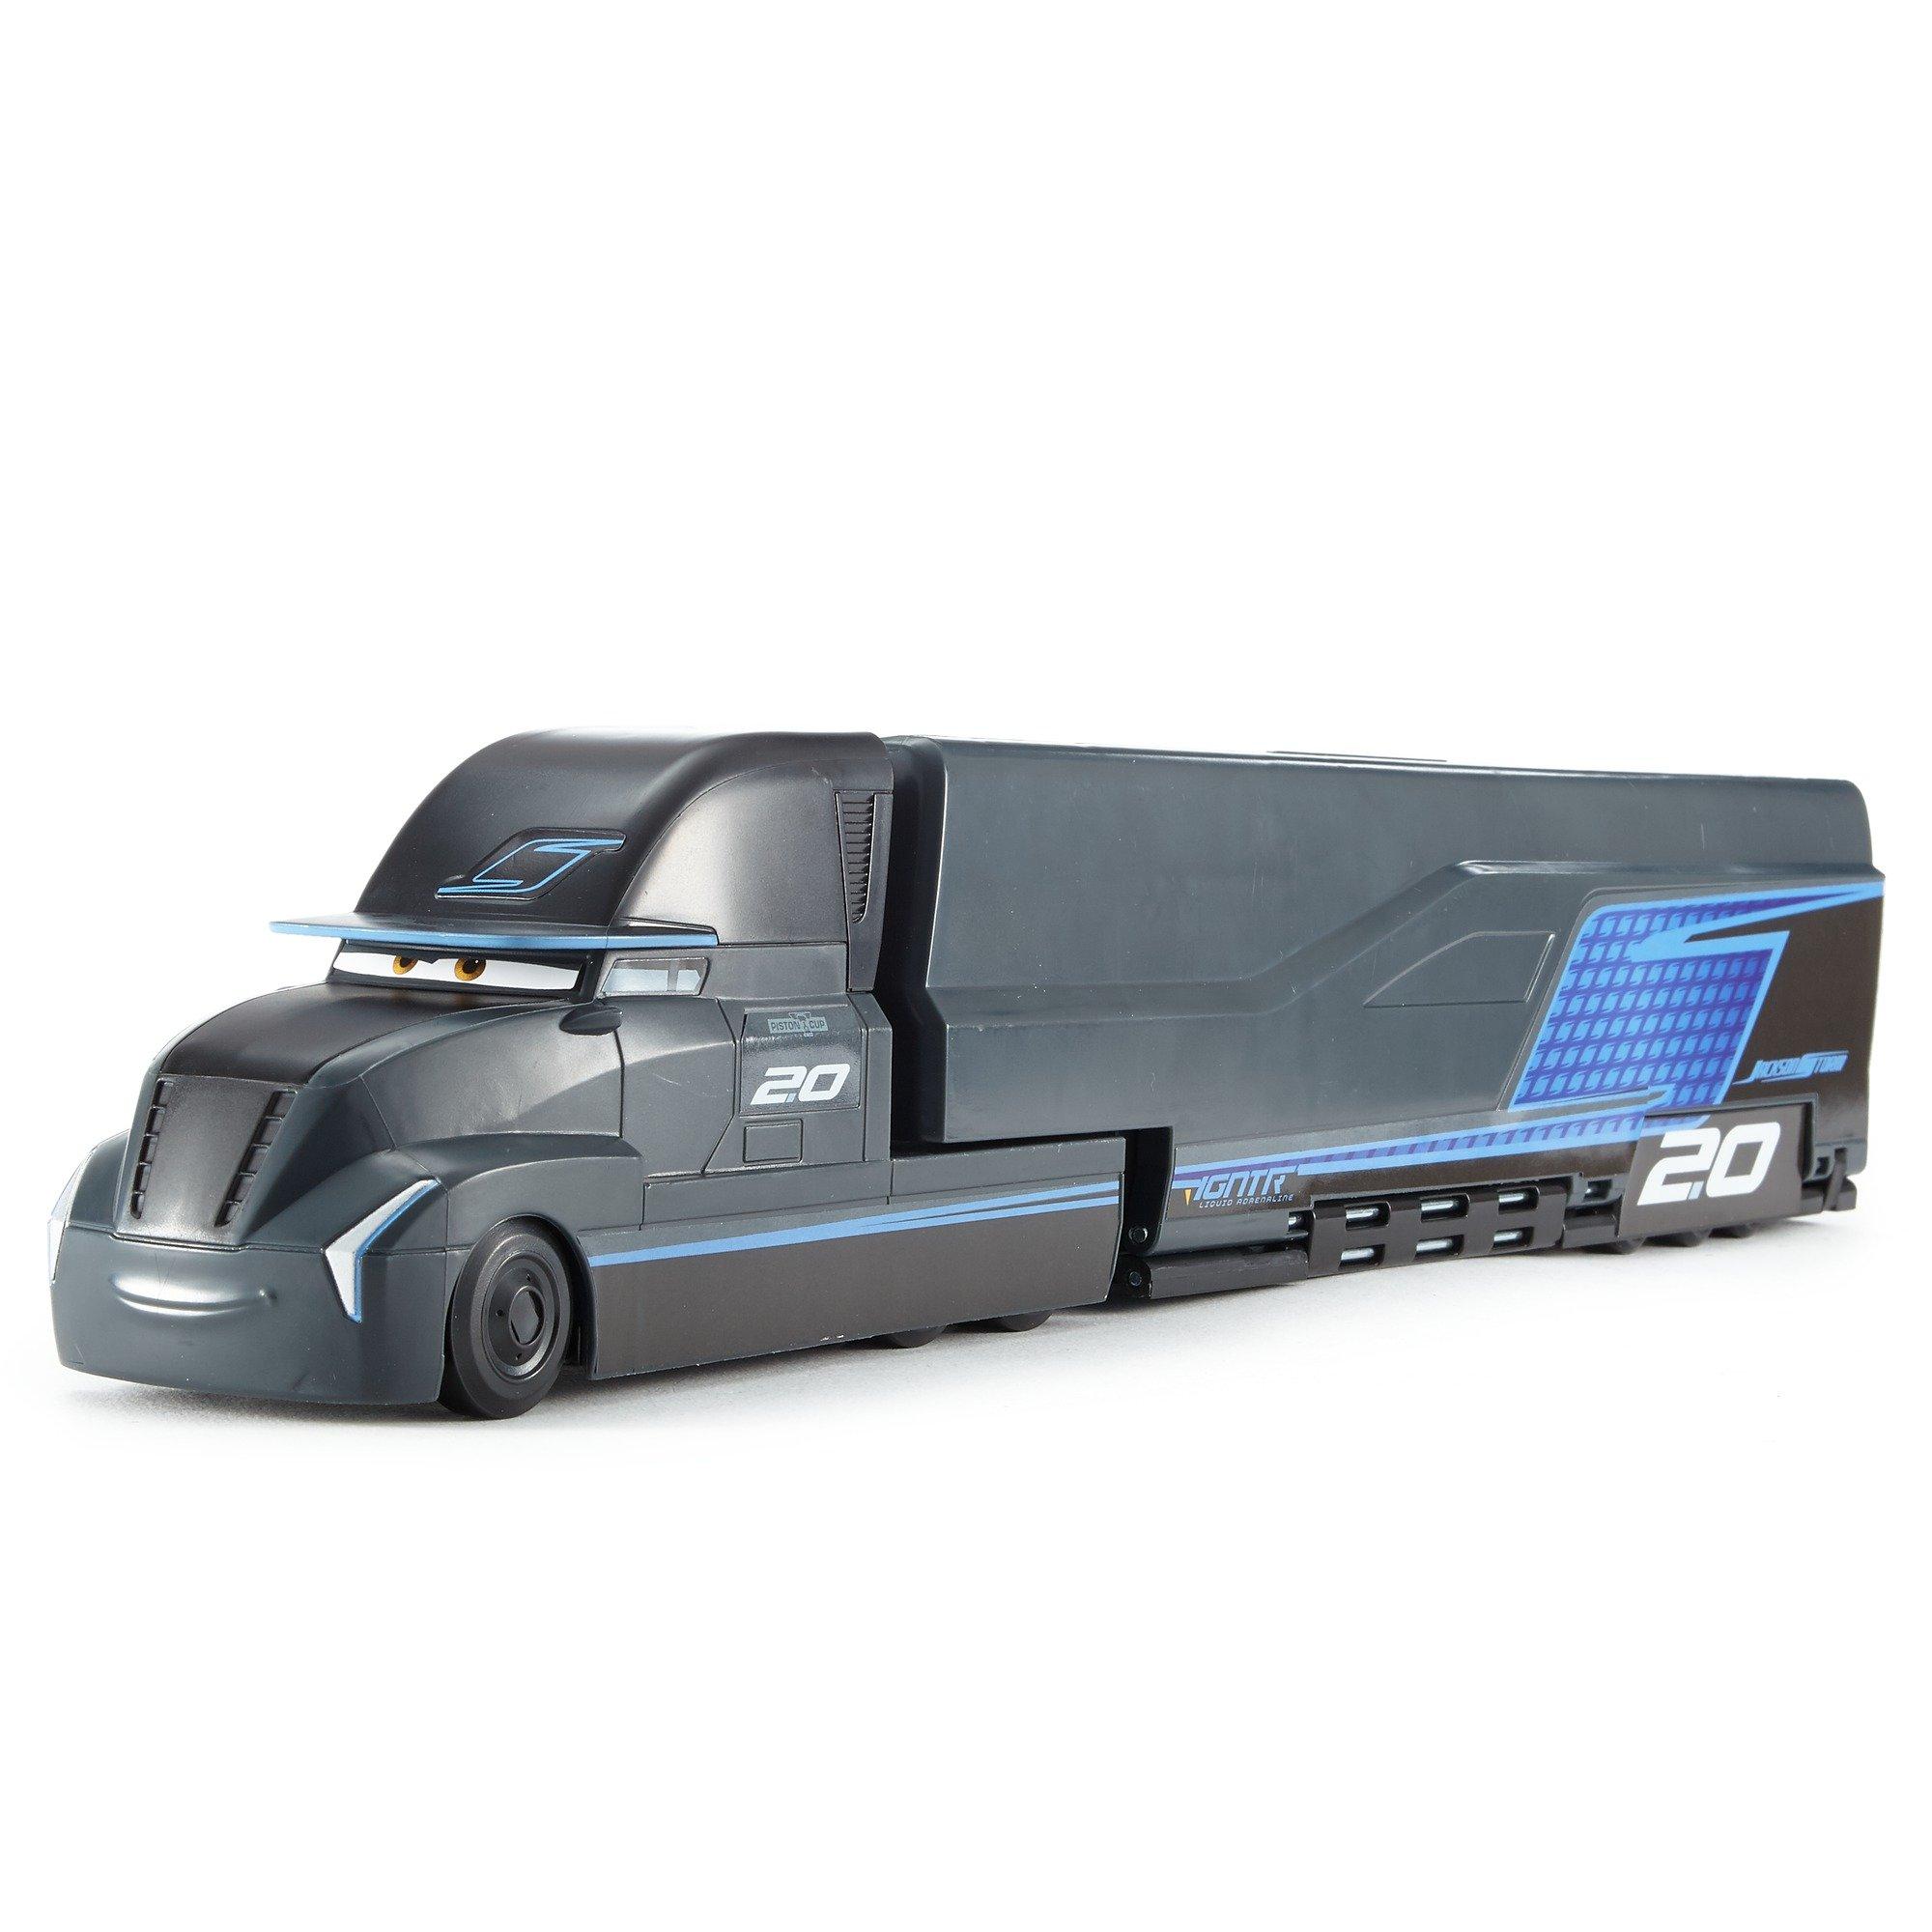 Disney Pixar Cars 3 Jackson Storm's Transforming Hauler Playset